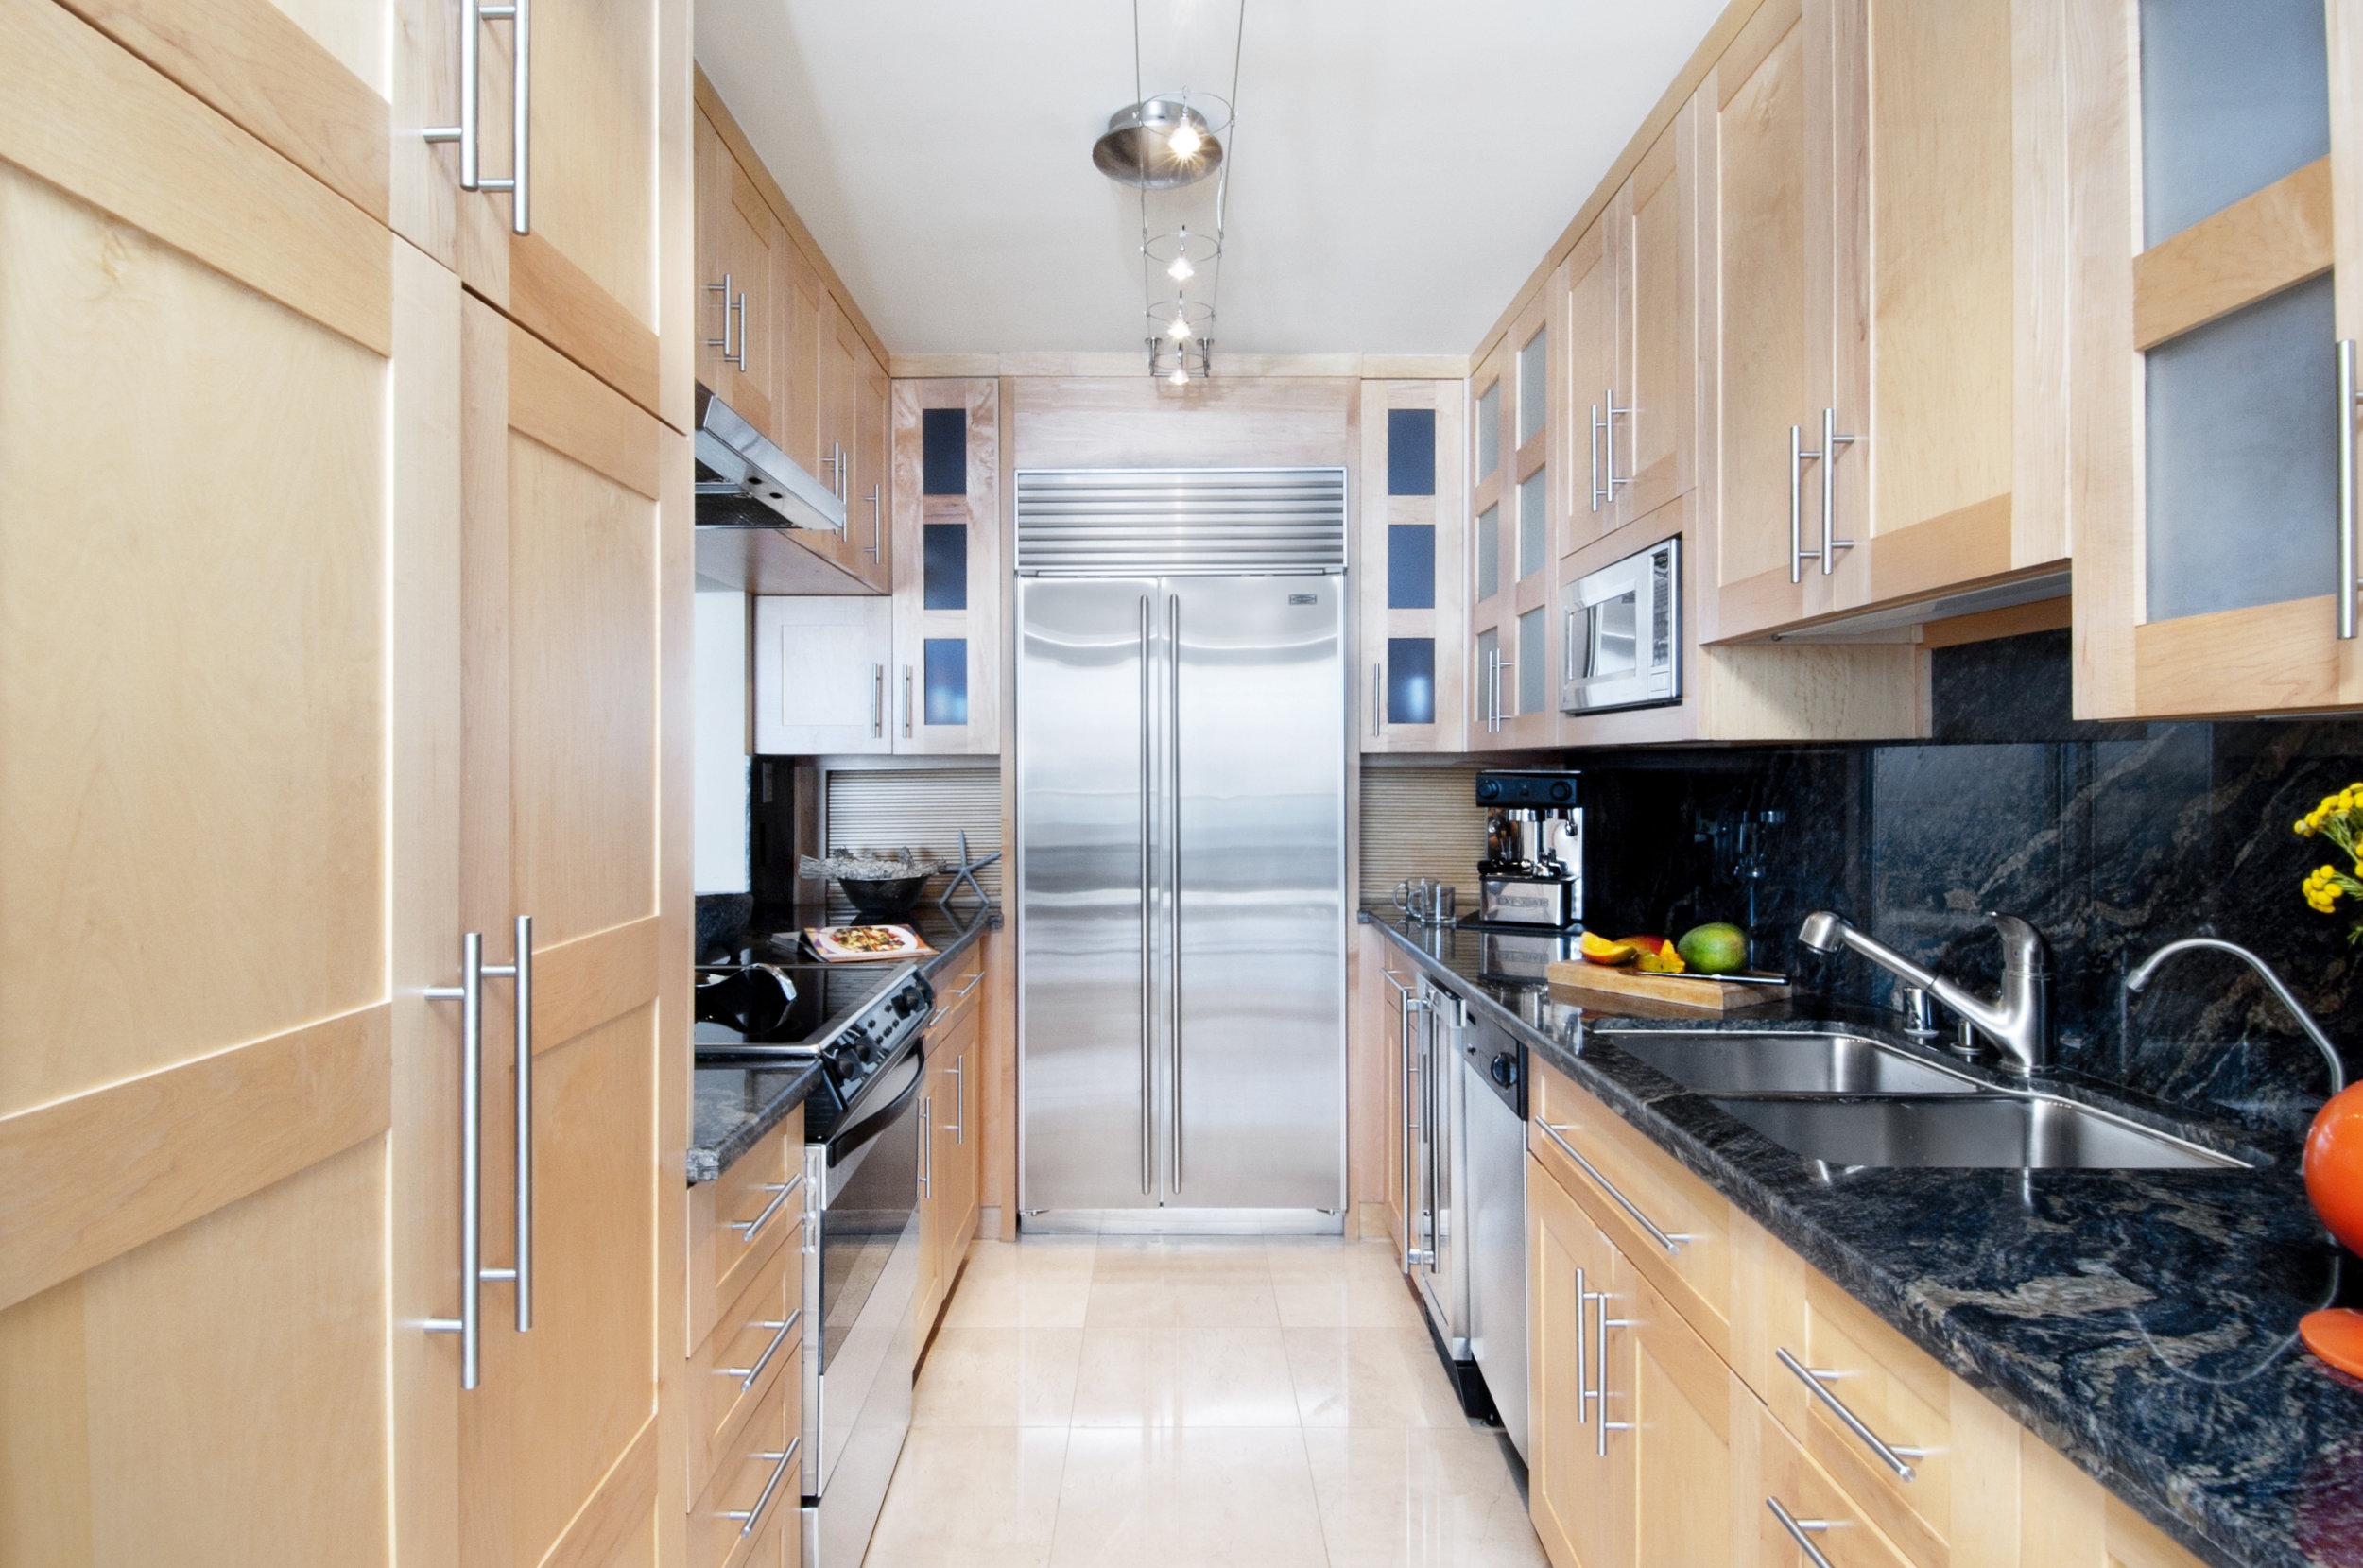 Sarah-barnard-design-modern-kitchen-remodel.jpg